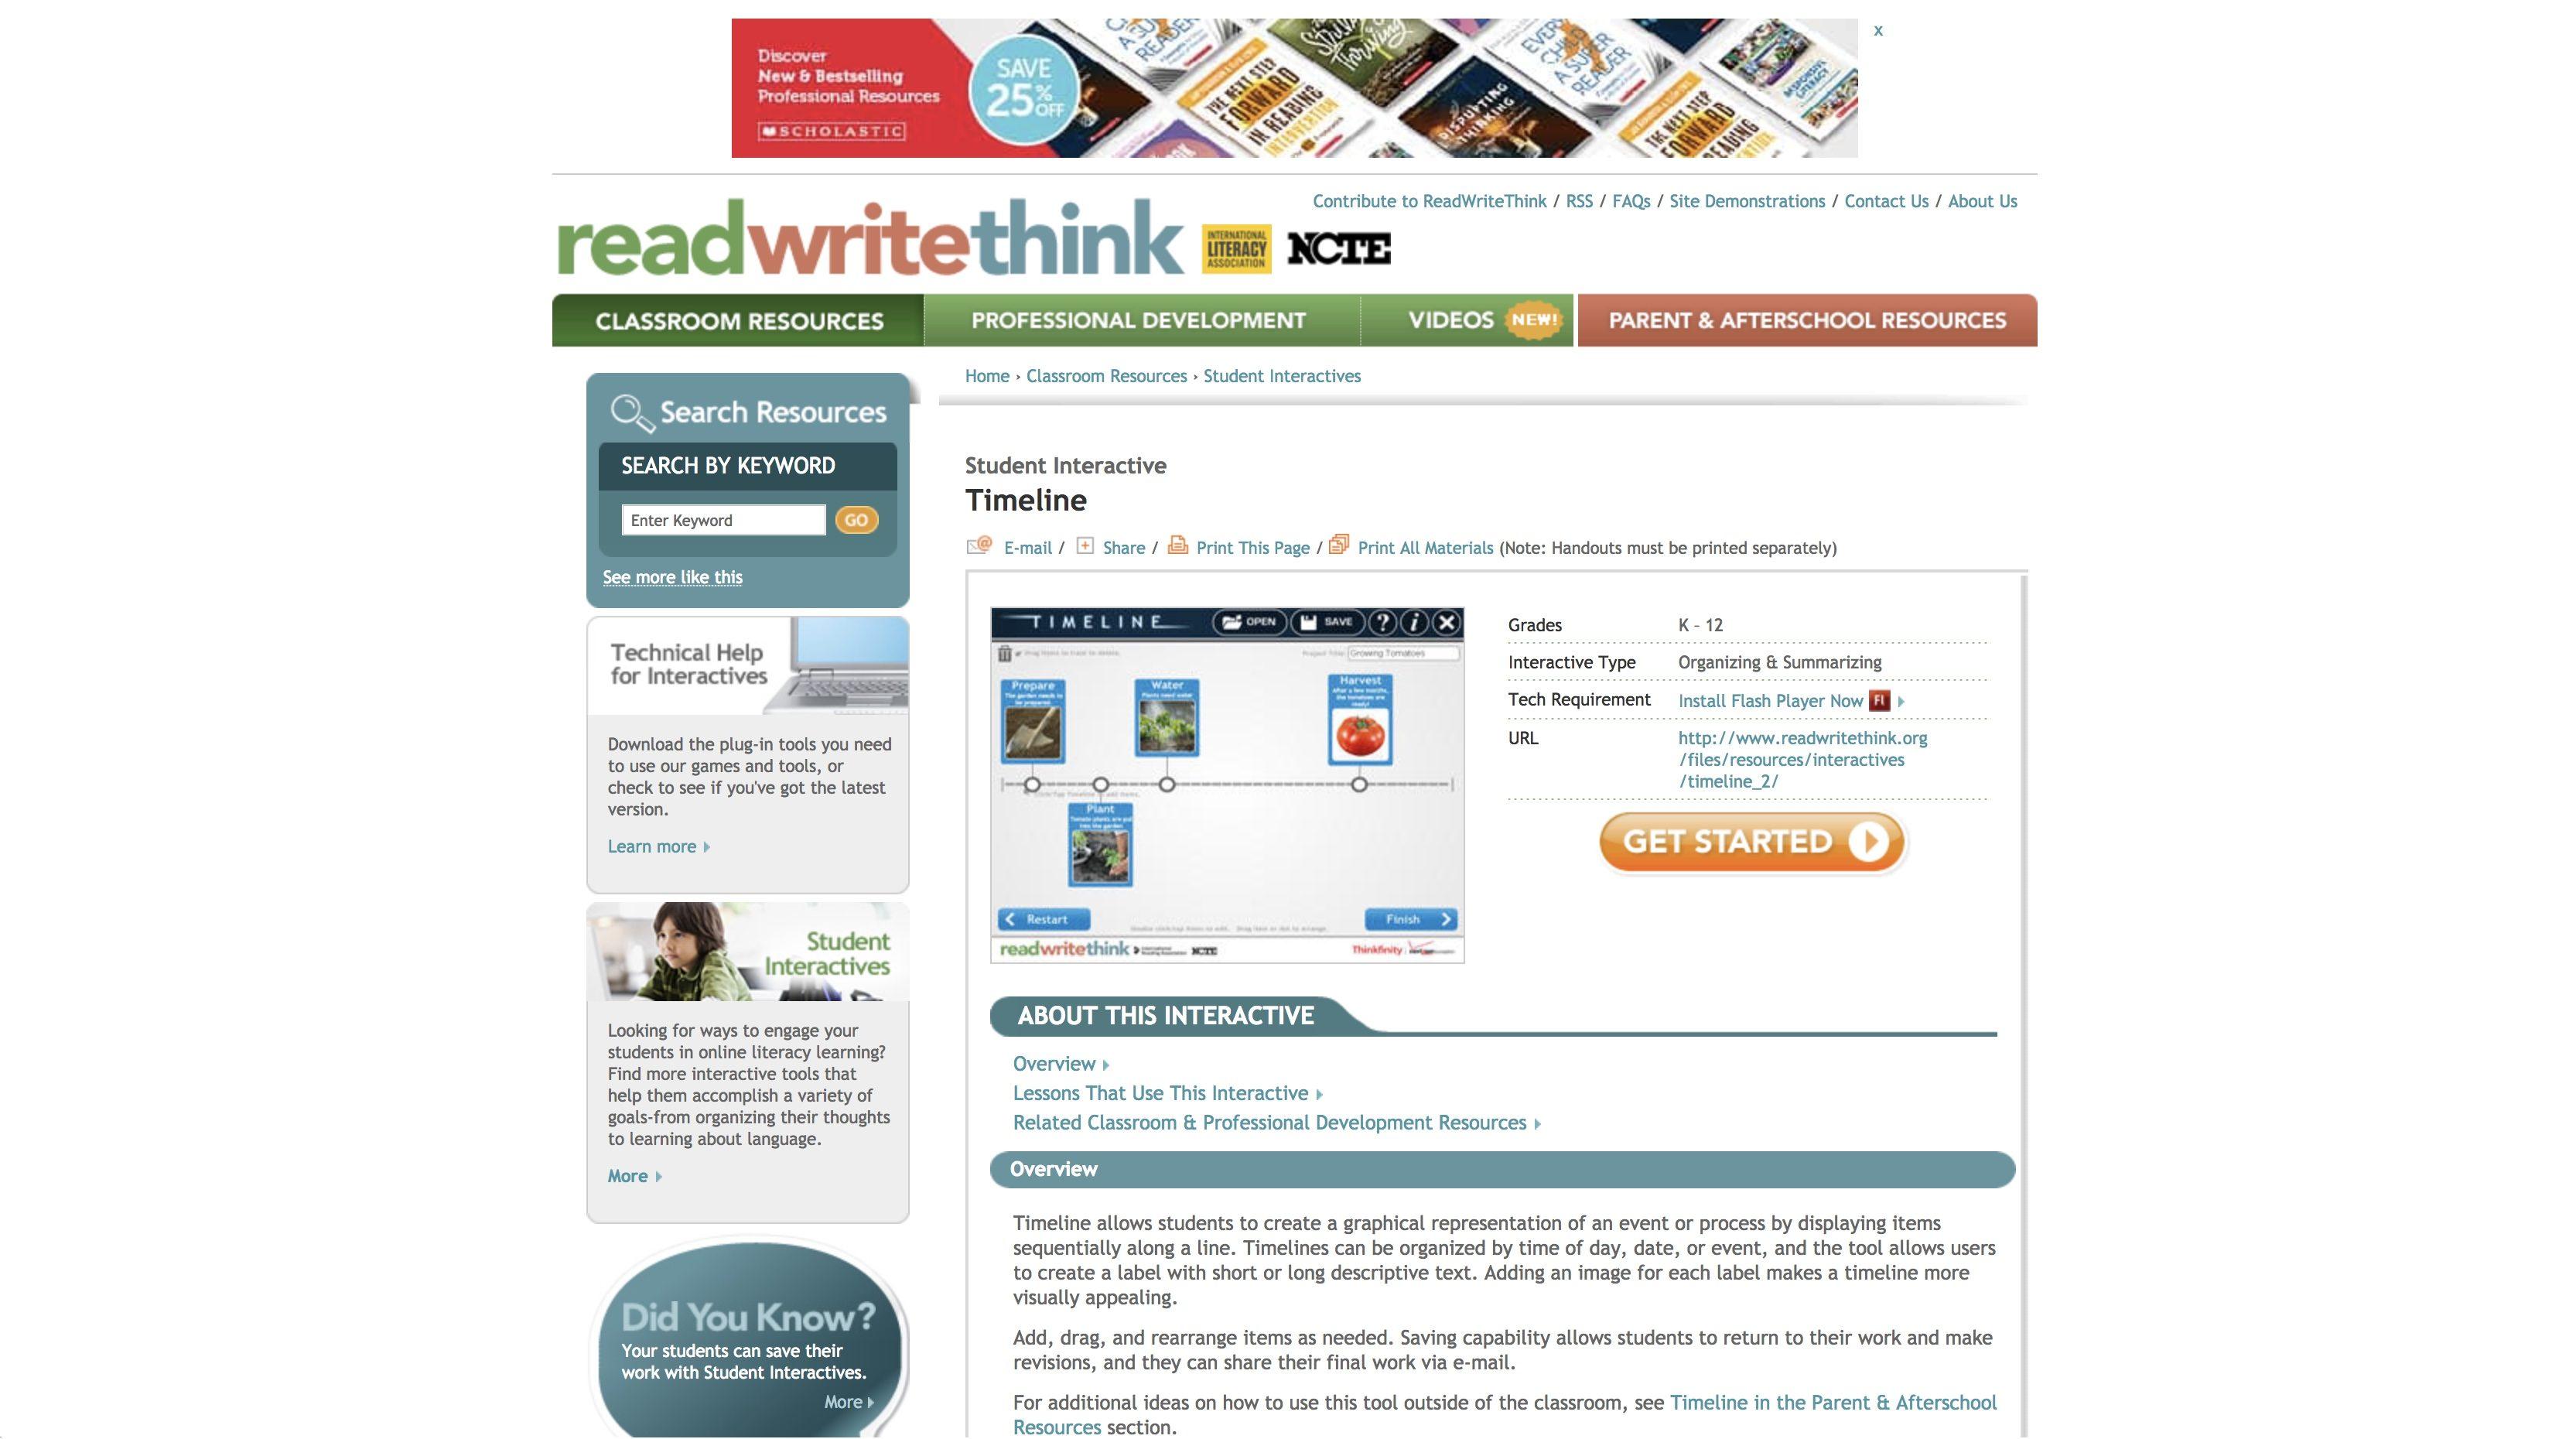 Readwritethink